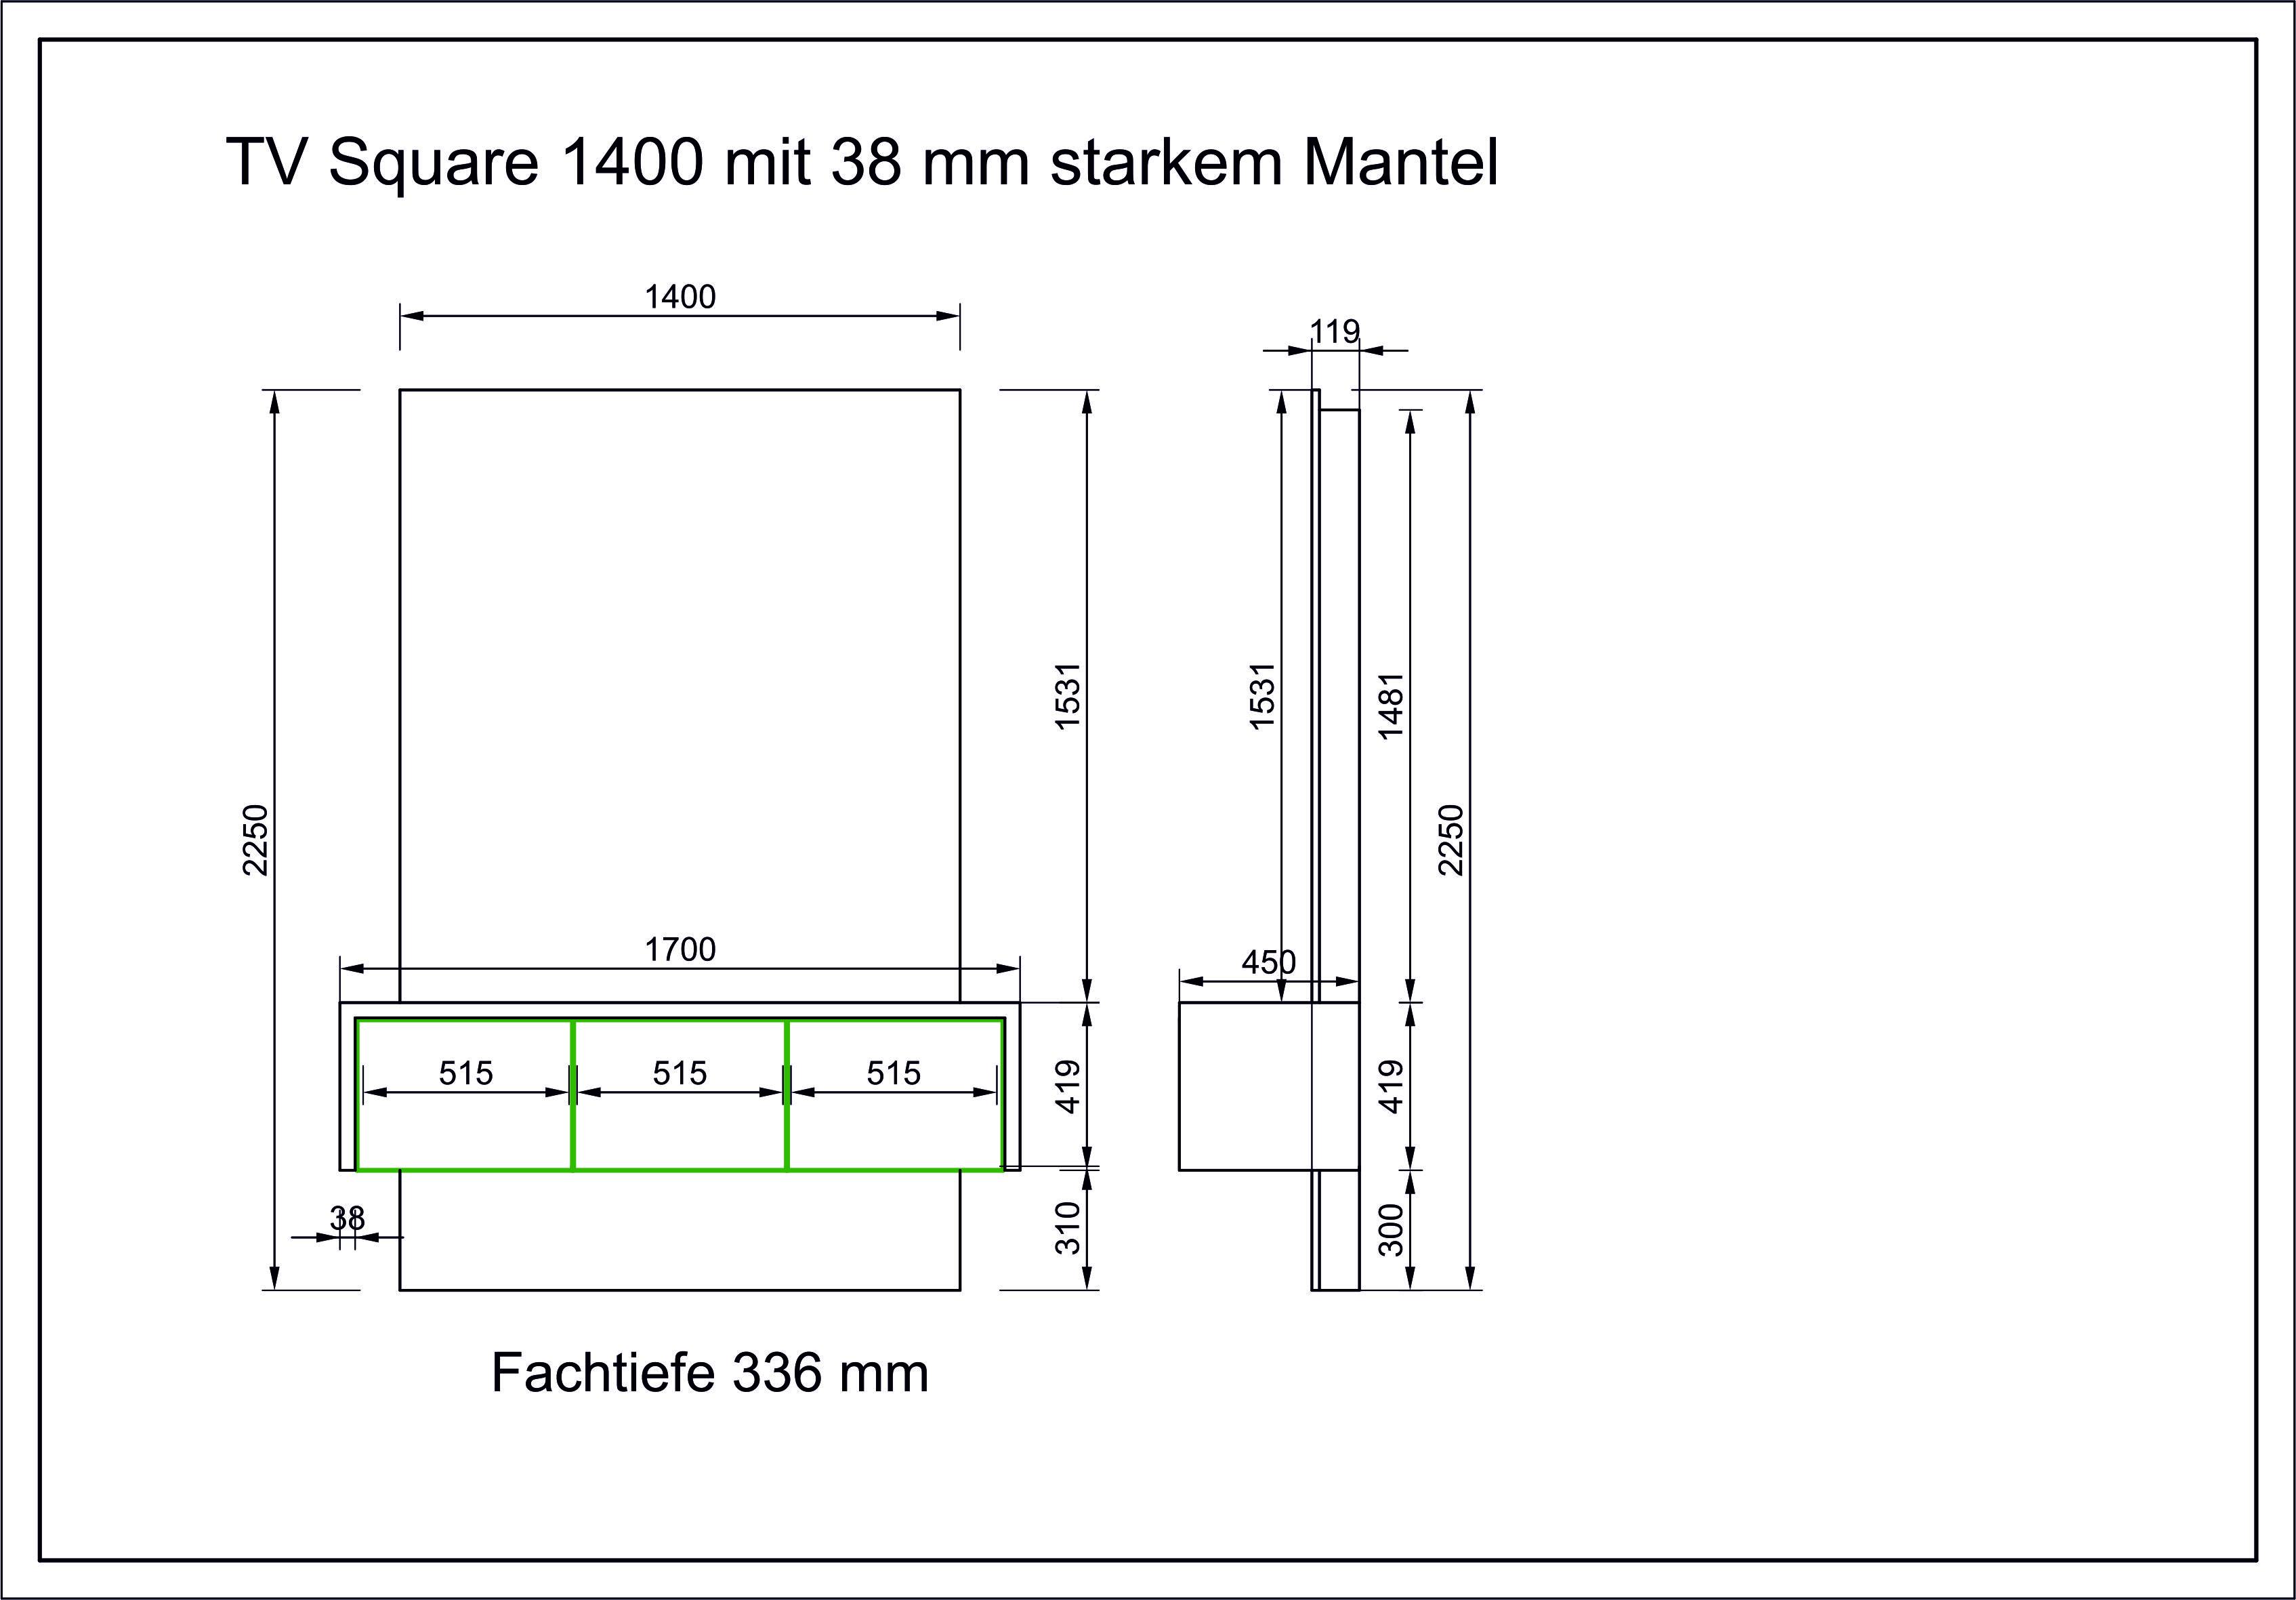 TV-Square-1400mm-mit-38mm-Mantel